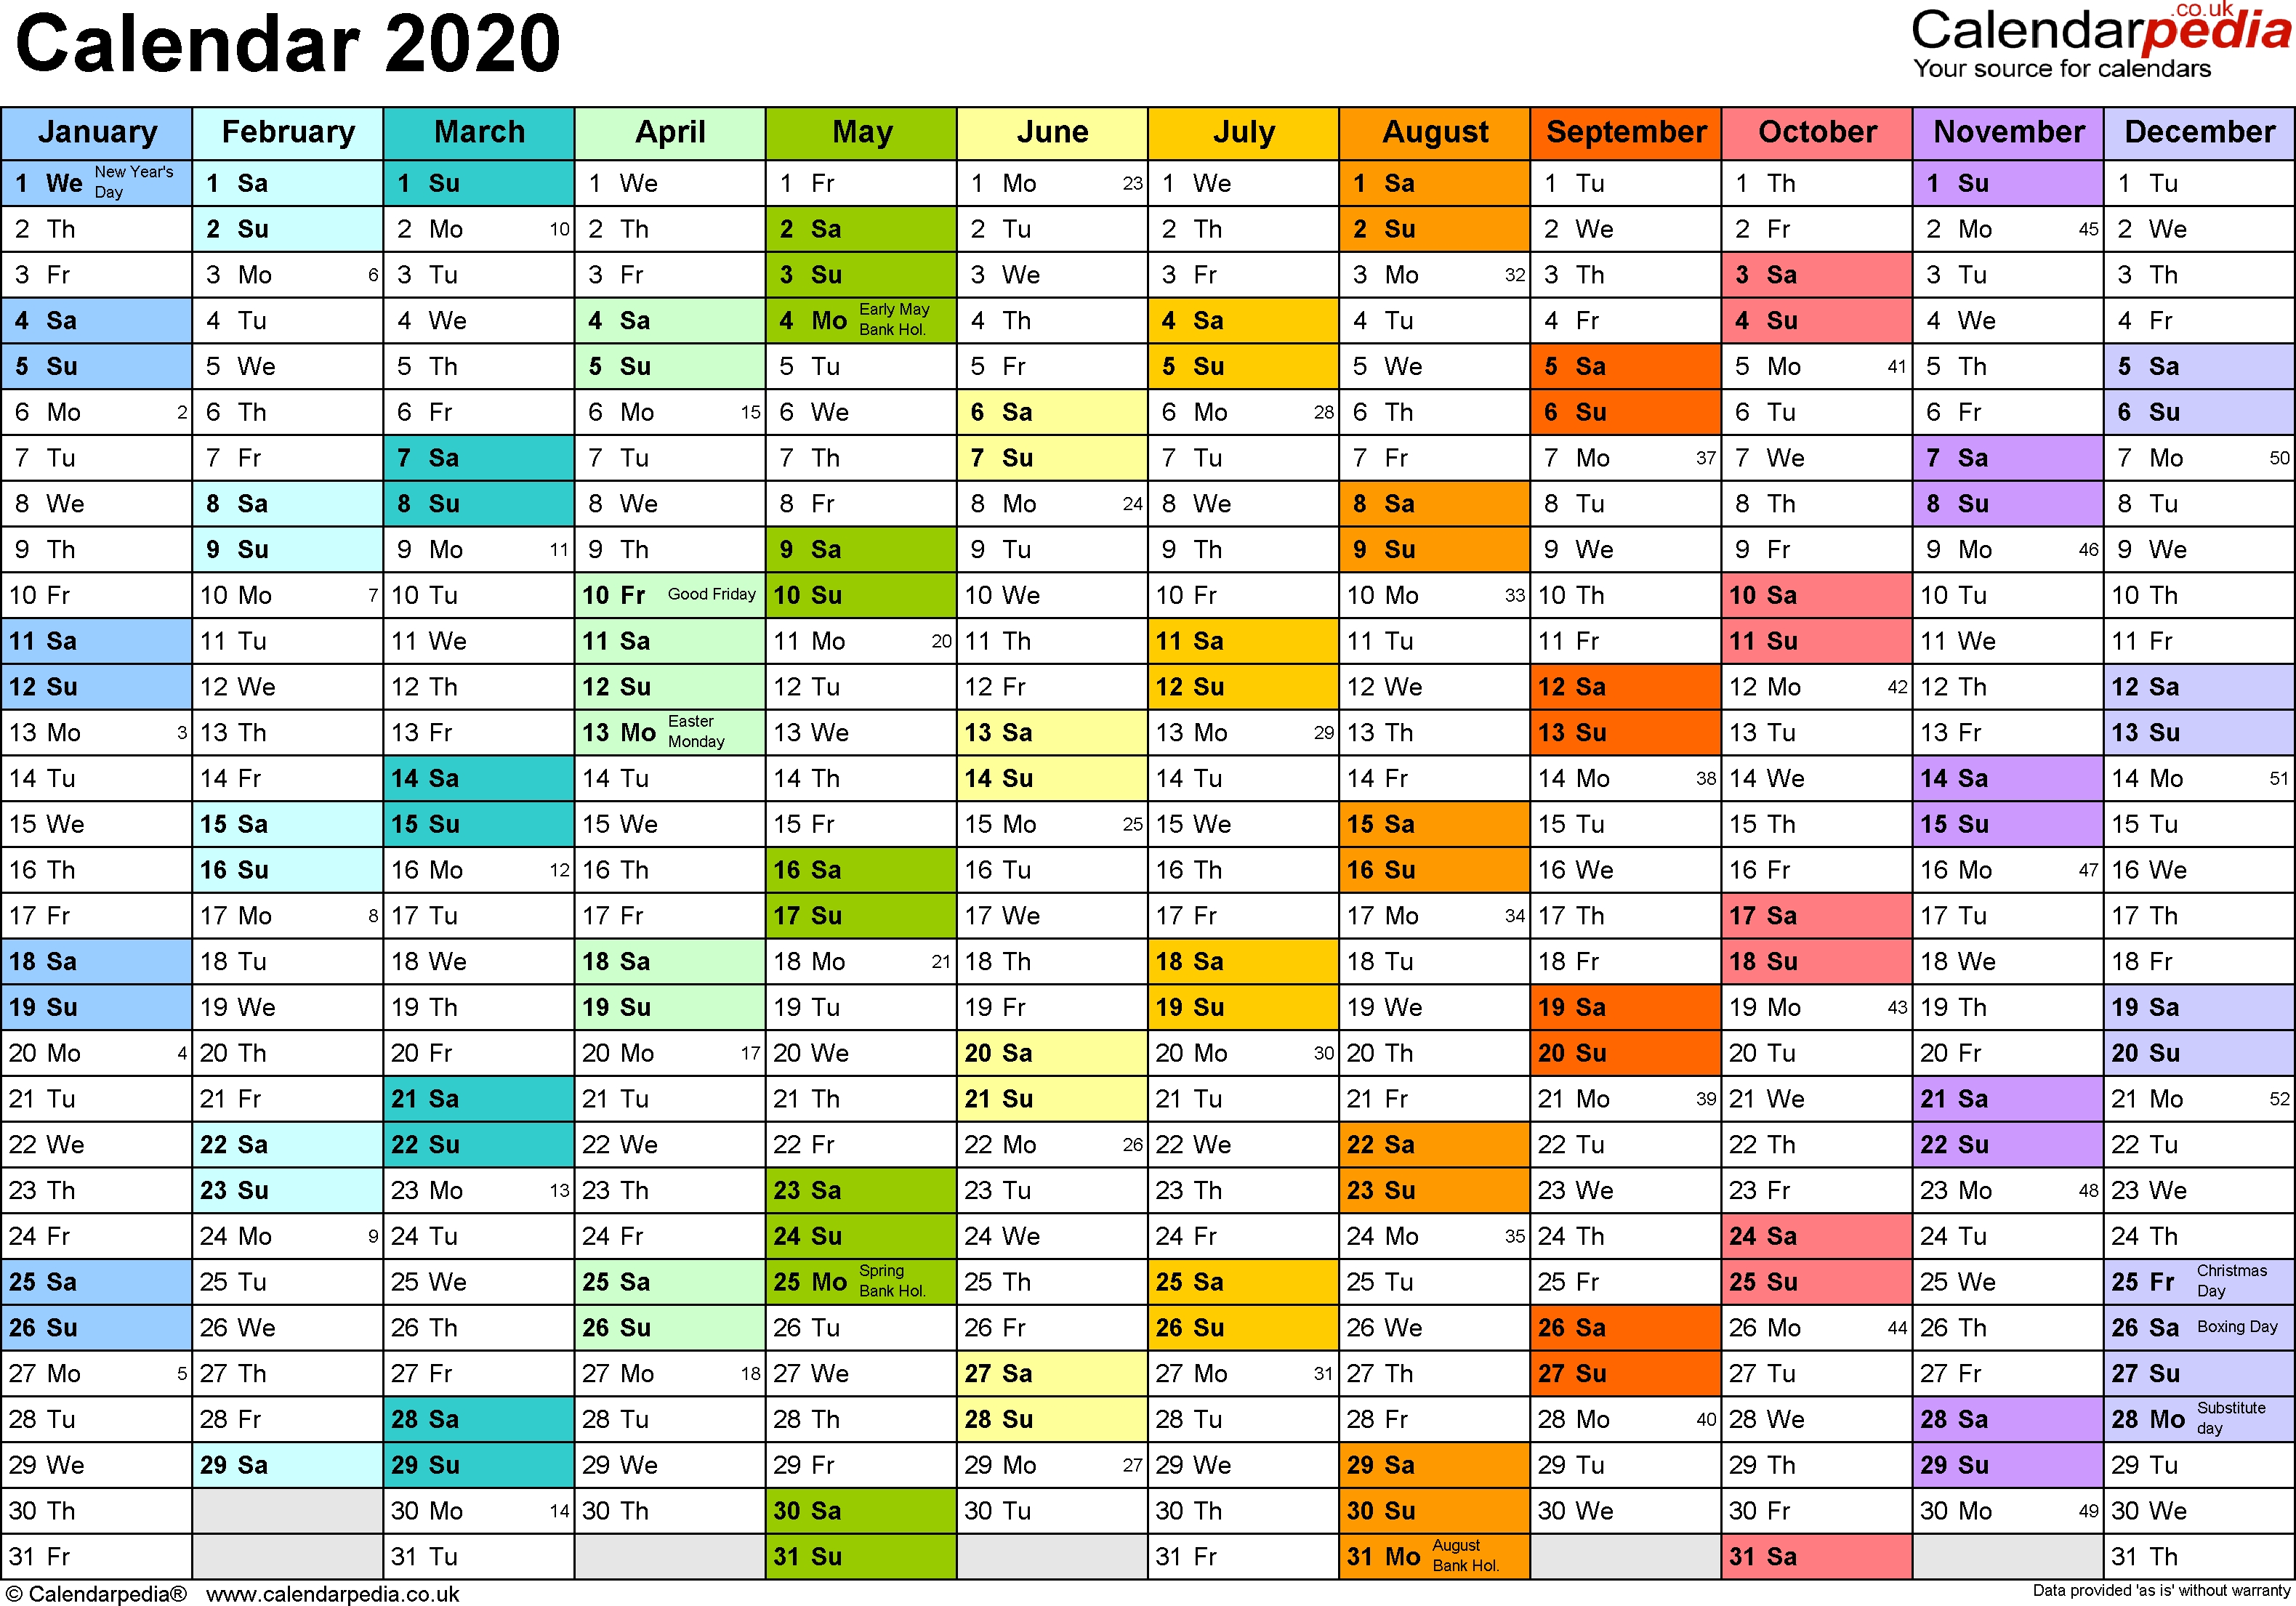 Calendar 2020 Uk 16 Free Printable Pdf Templates